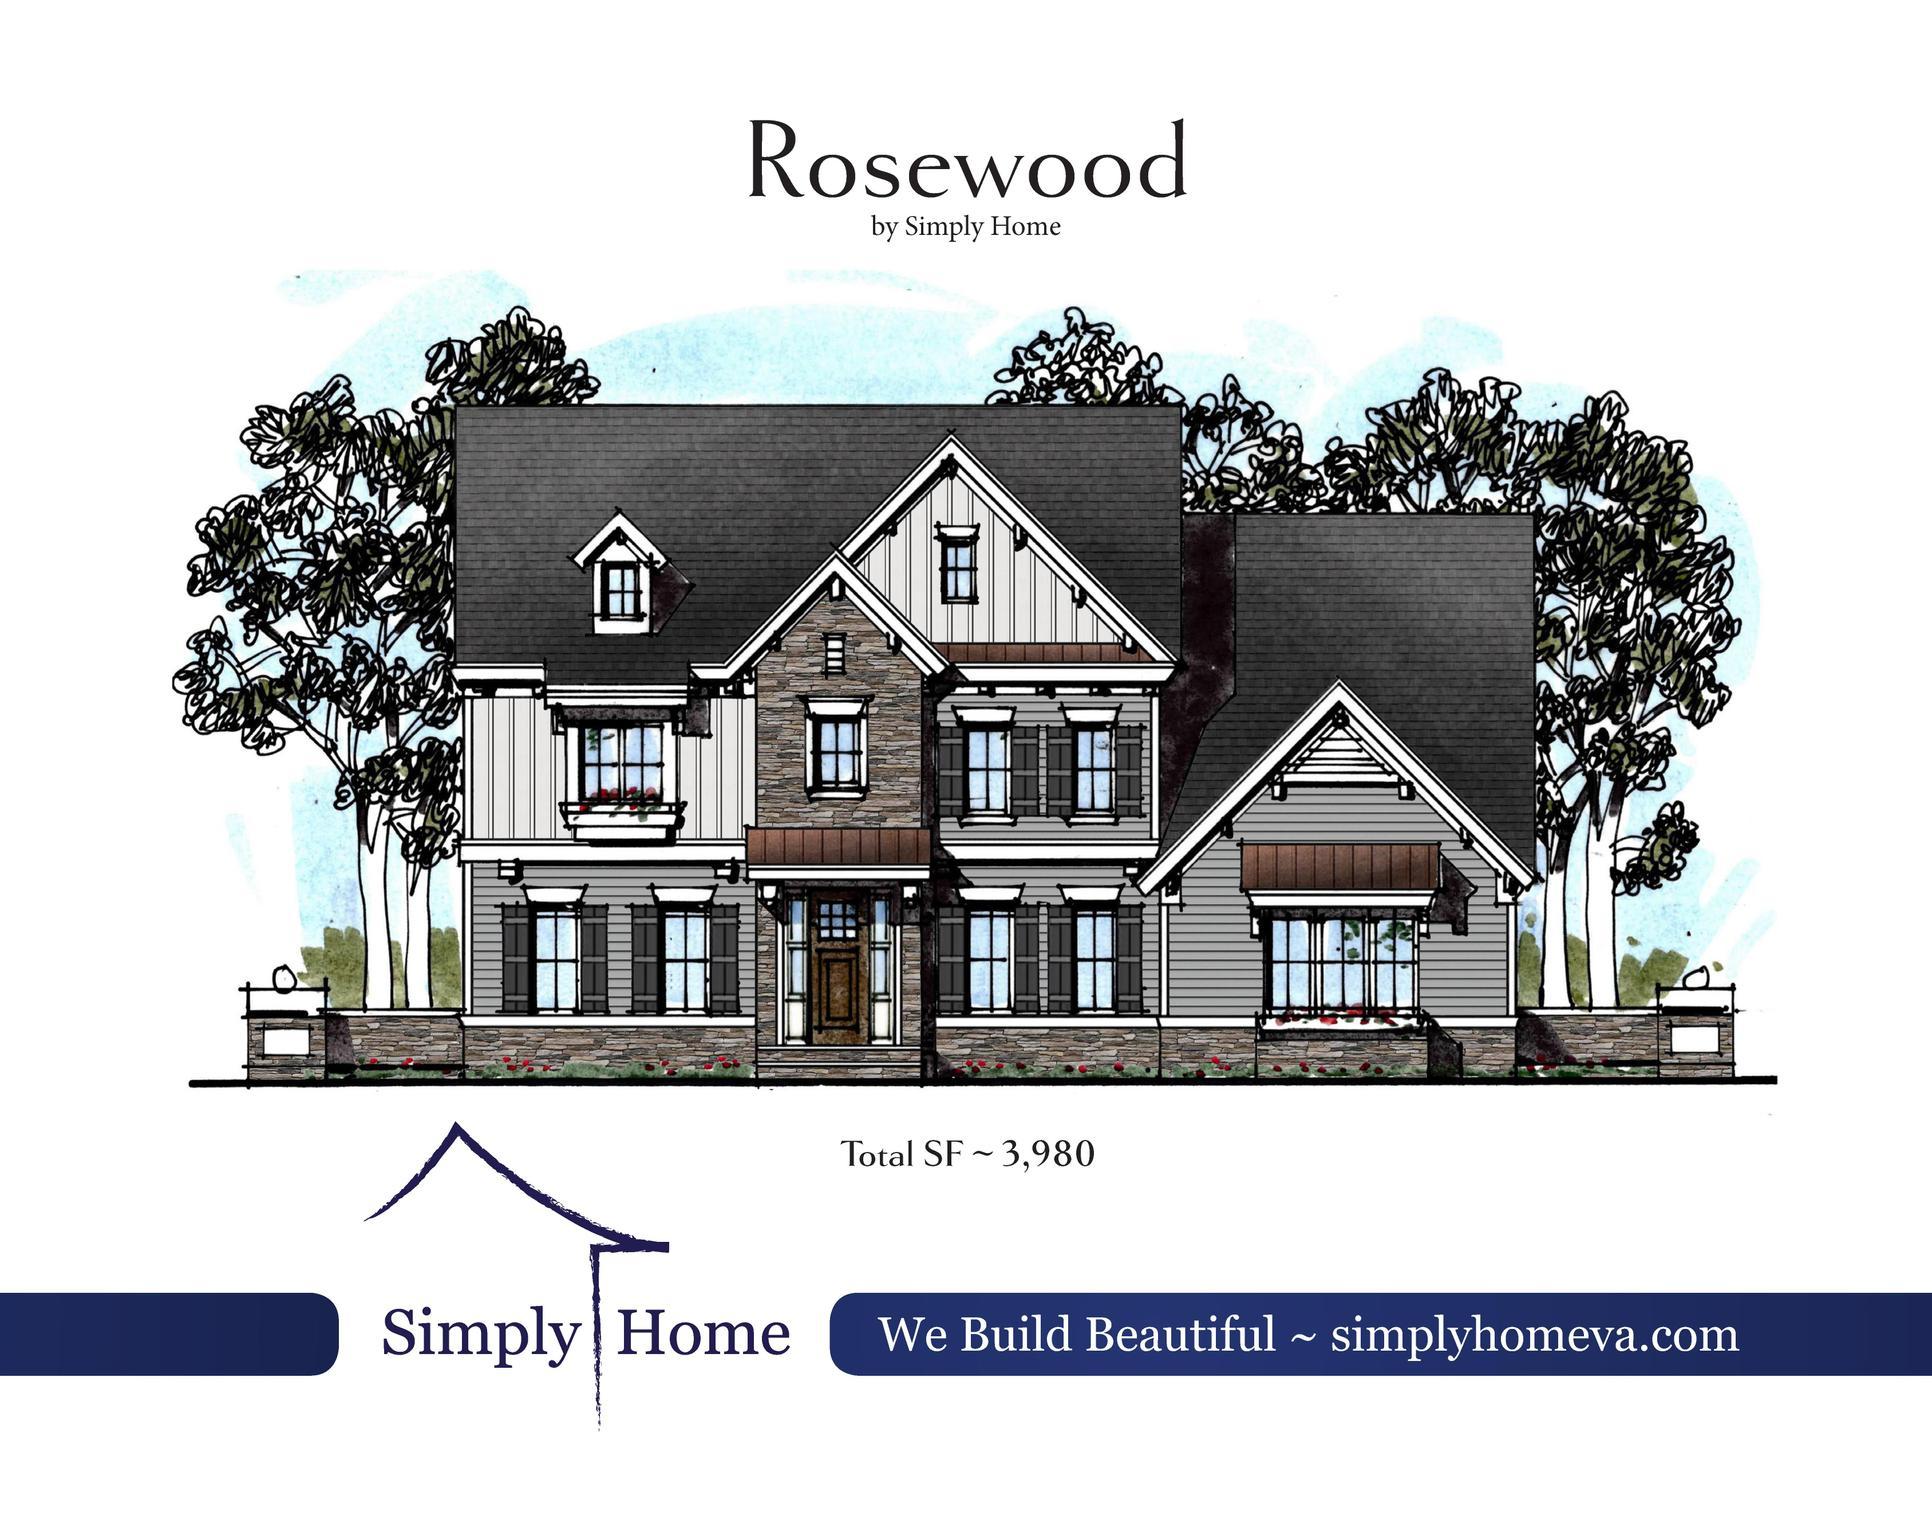 Rosewood Elevation A:Rosewood Elevation A